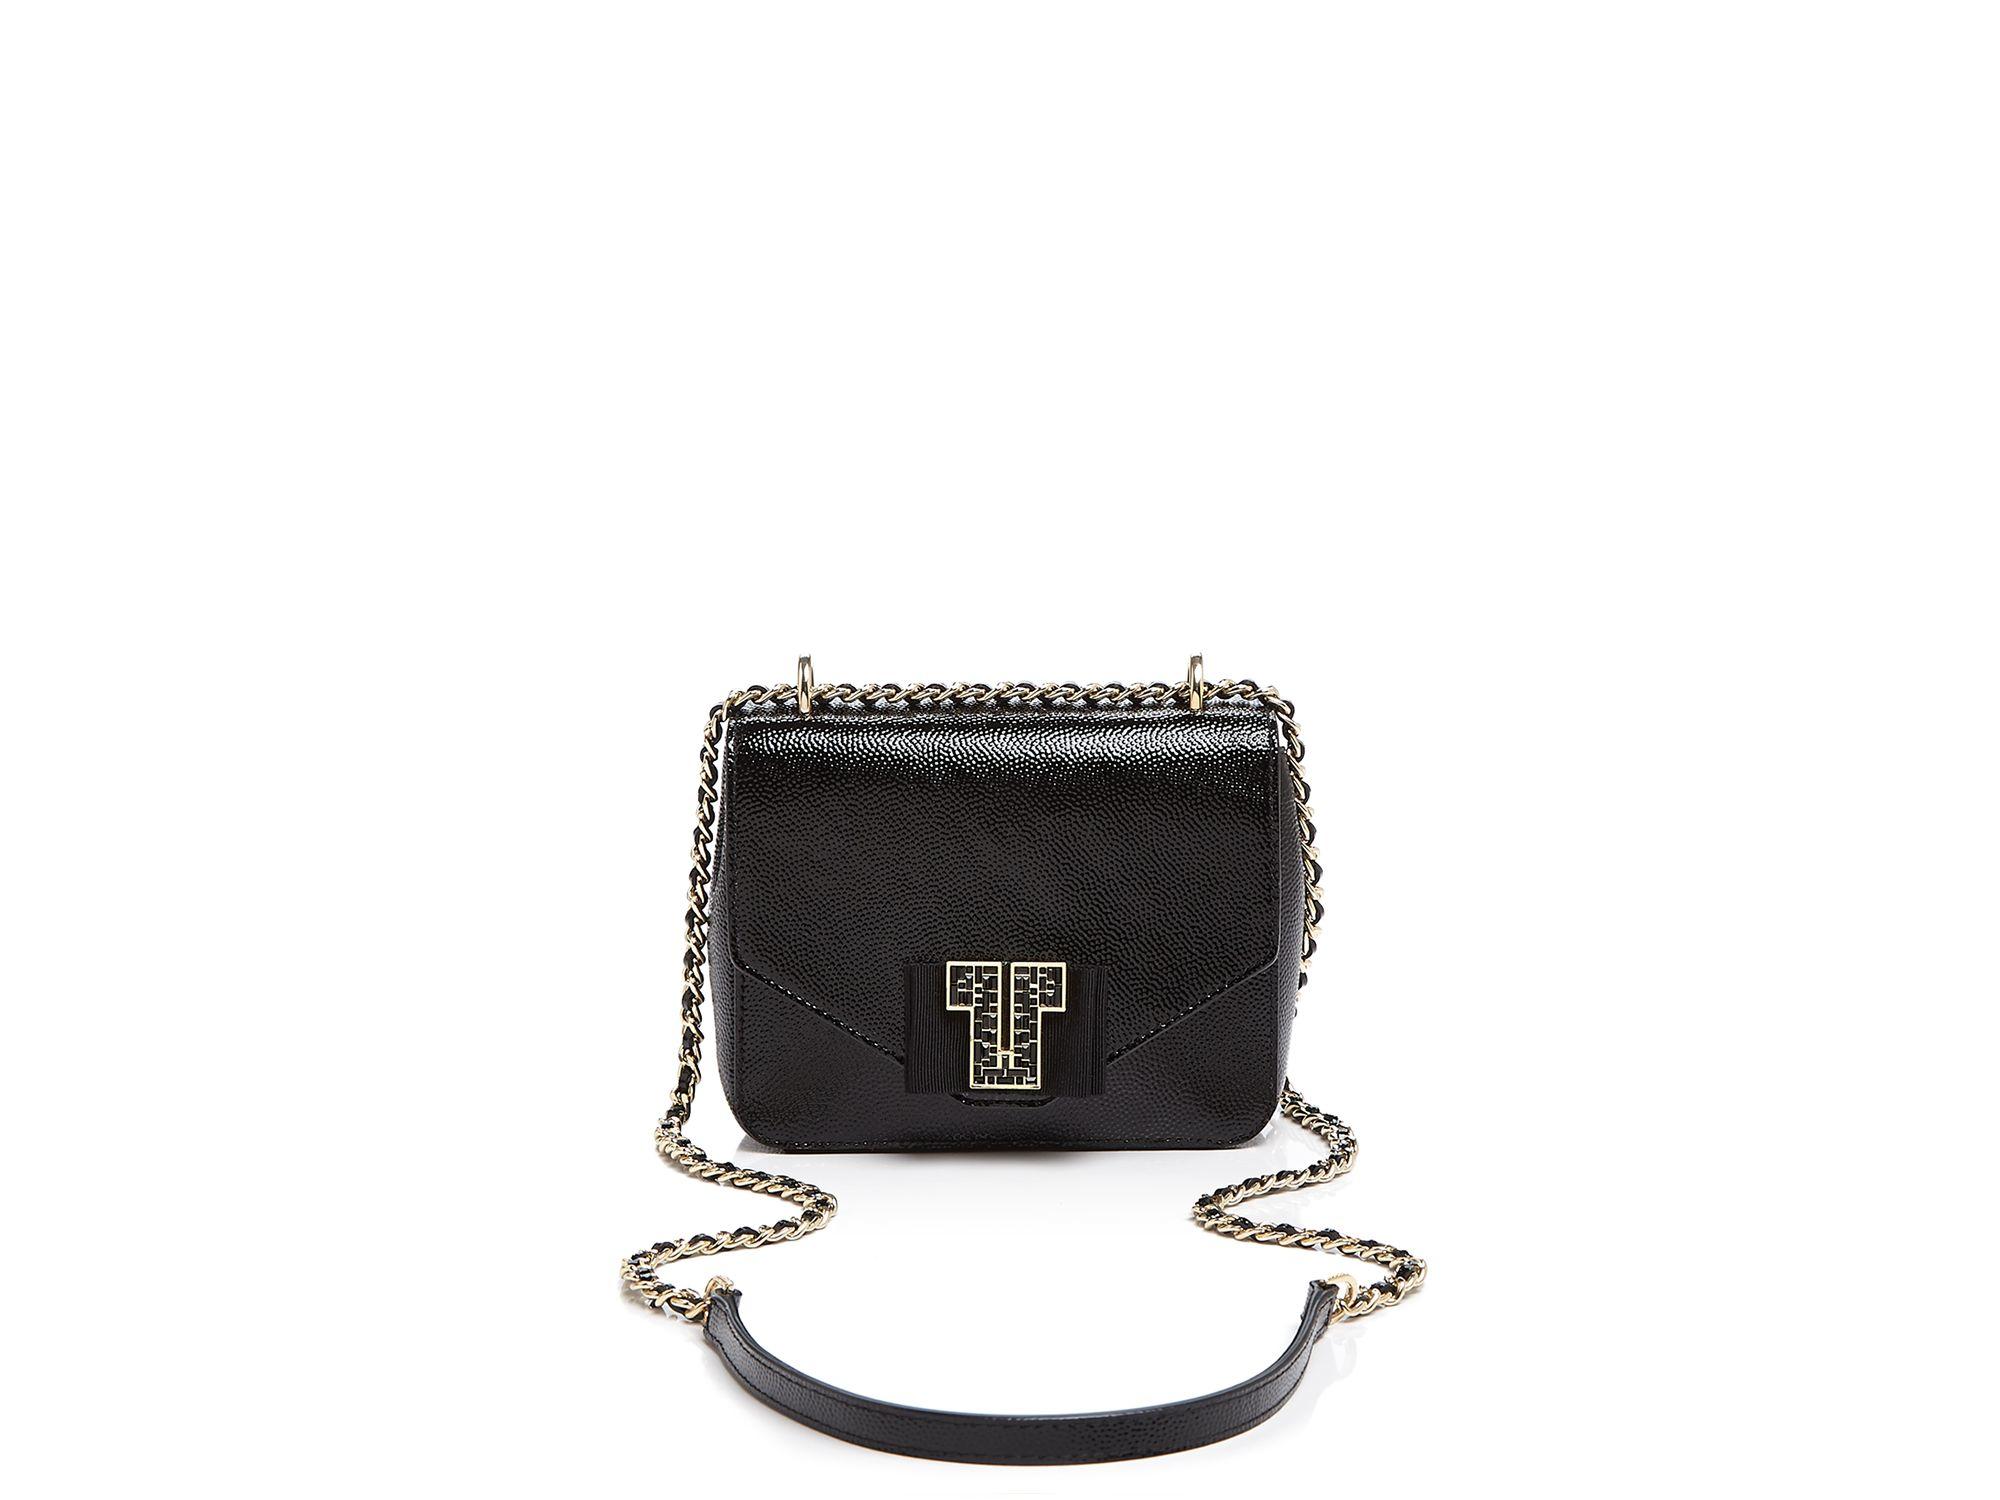 9ce35e151ea3 Lyst - Tory Burch Kira Deco-t Mini Chain Shoulder Bag in Black